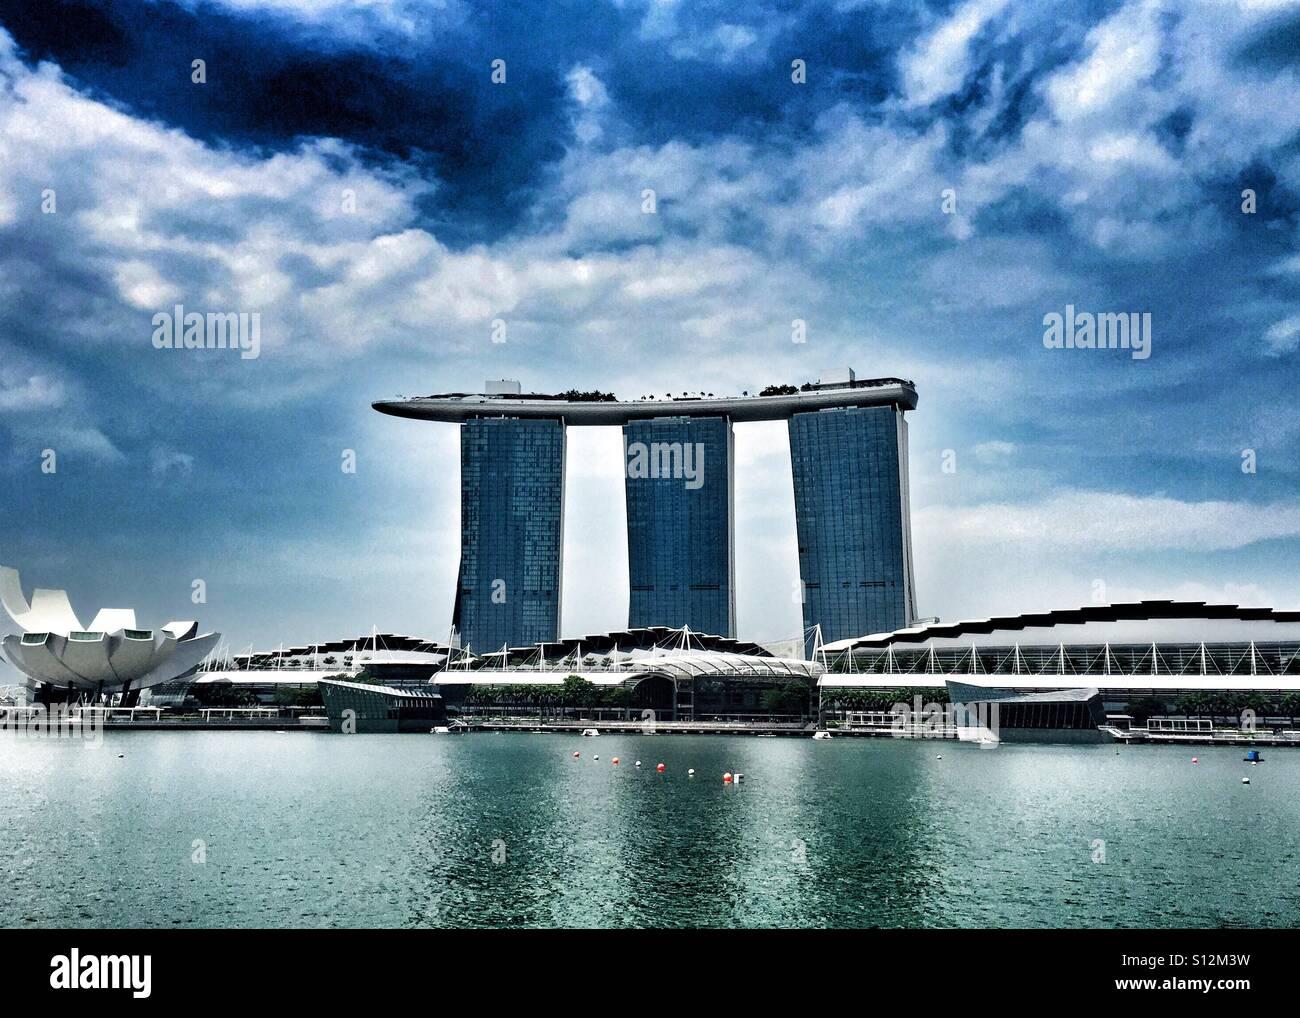 Marina bay sands Singapore - Stock Image